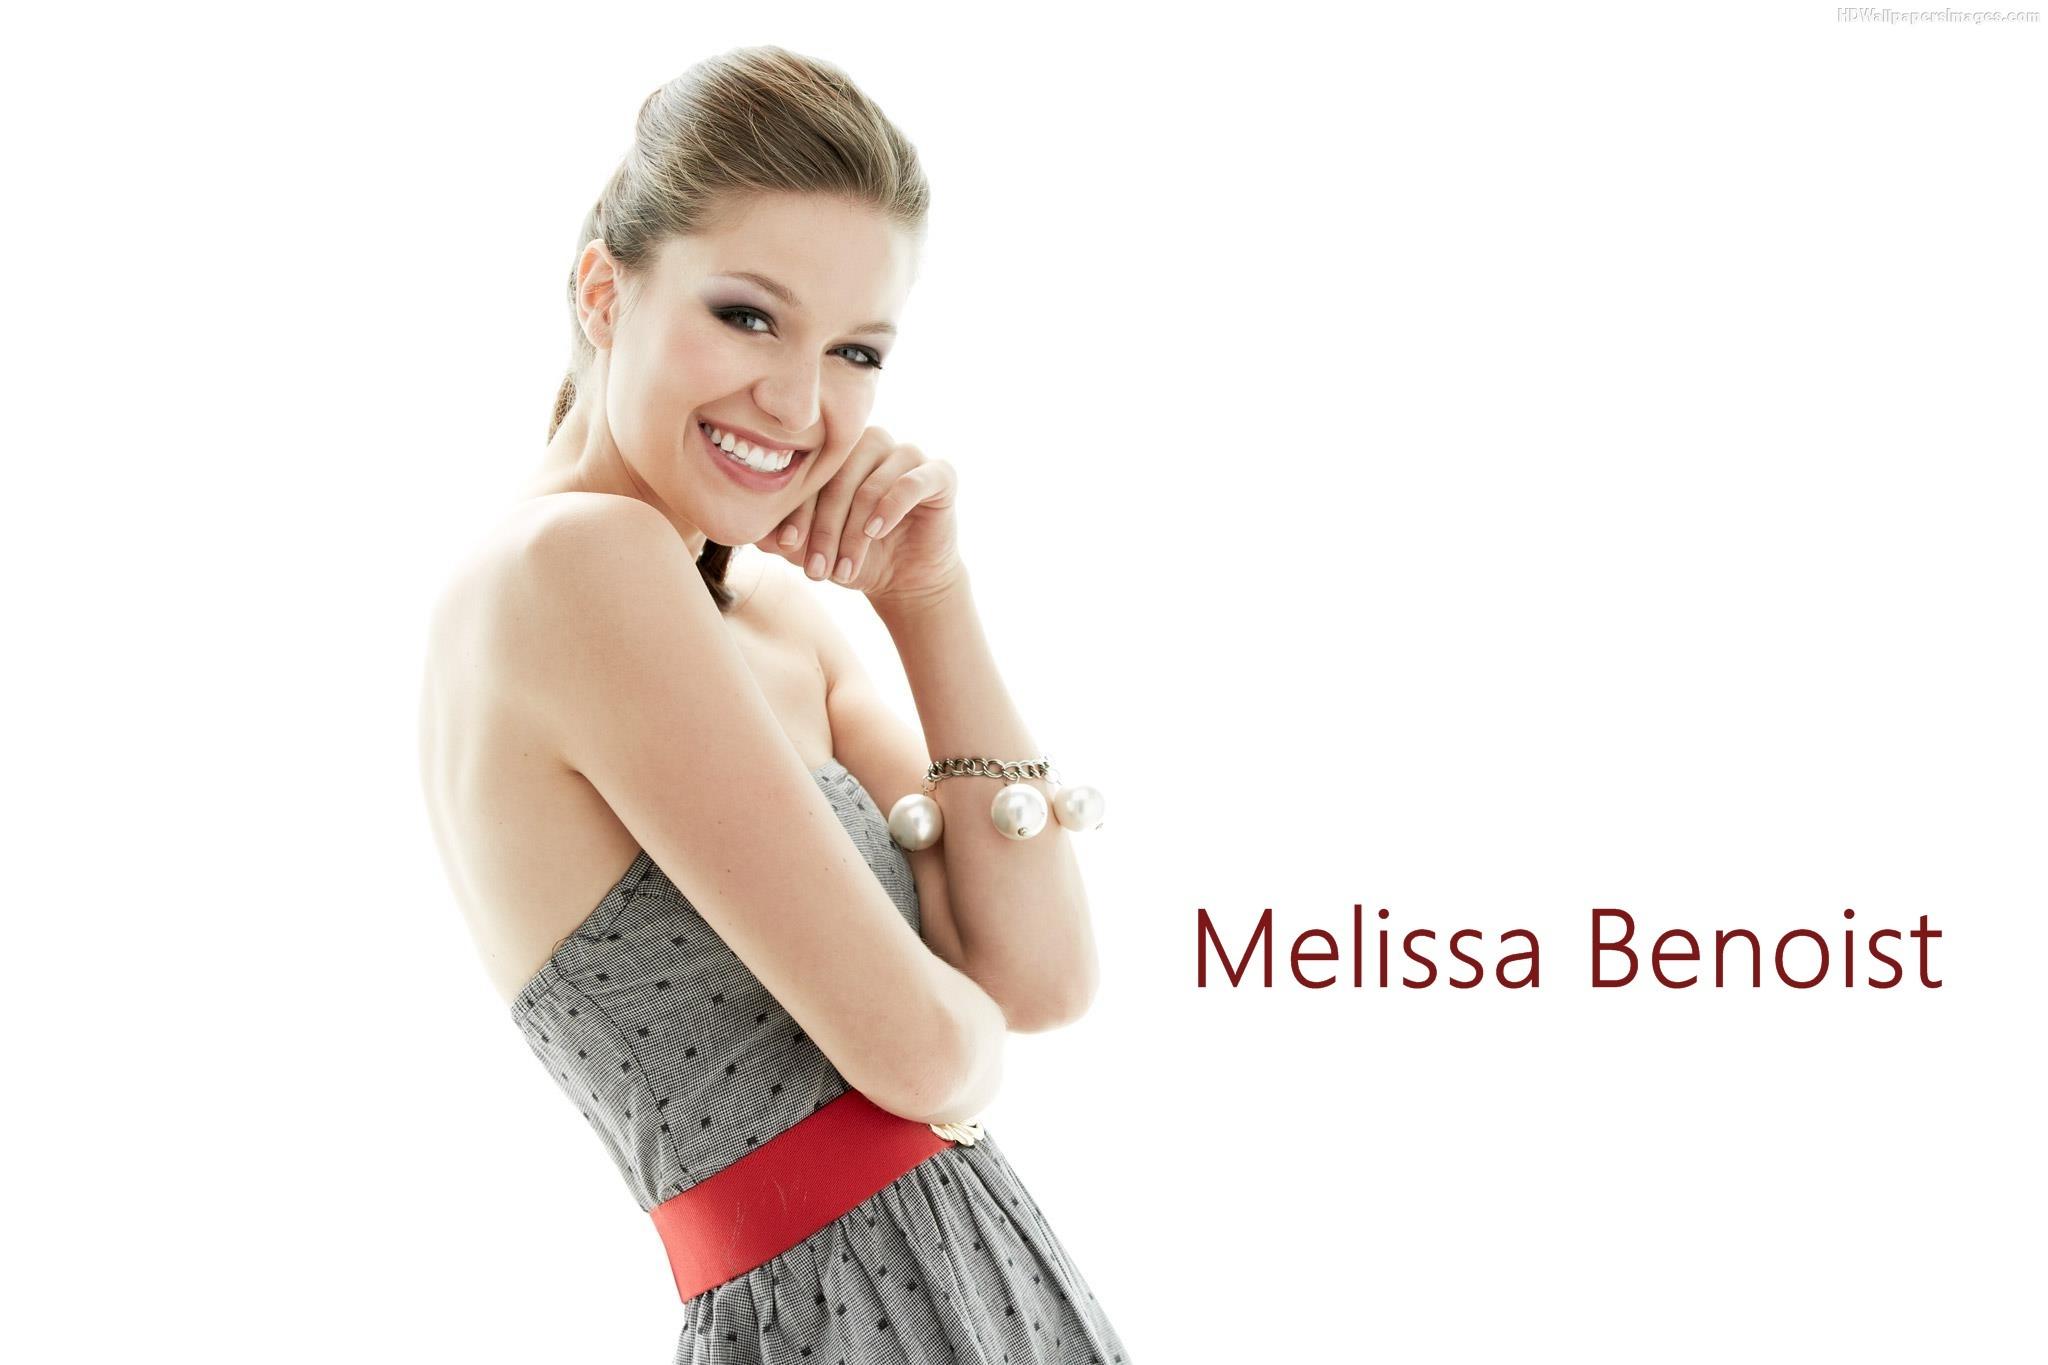 Melissa Gorga 4k Wallpapers: Melissa Benoist Wallpaper